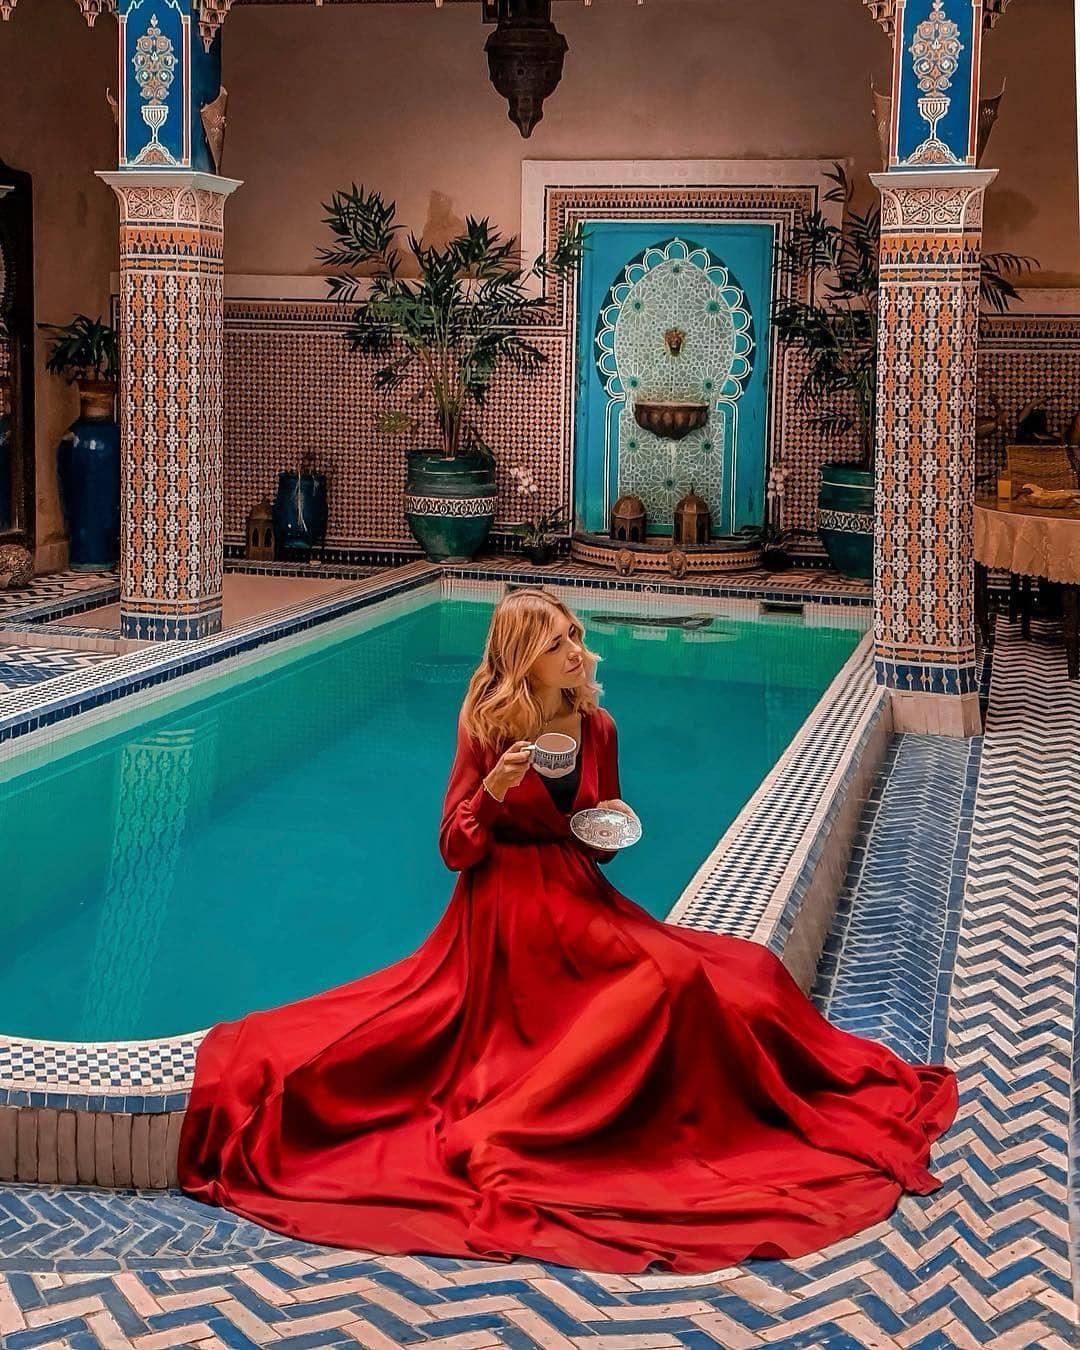 Good Morning Marrakech Wishing You A Happy Monday Follow Us On Moroccohotels Photo Deniselascala Marrakech Beautiful Destinations Trip Advisor